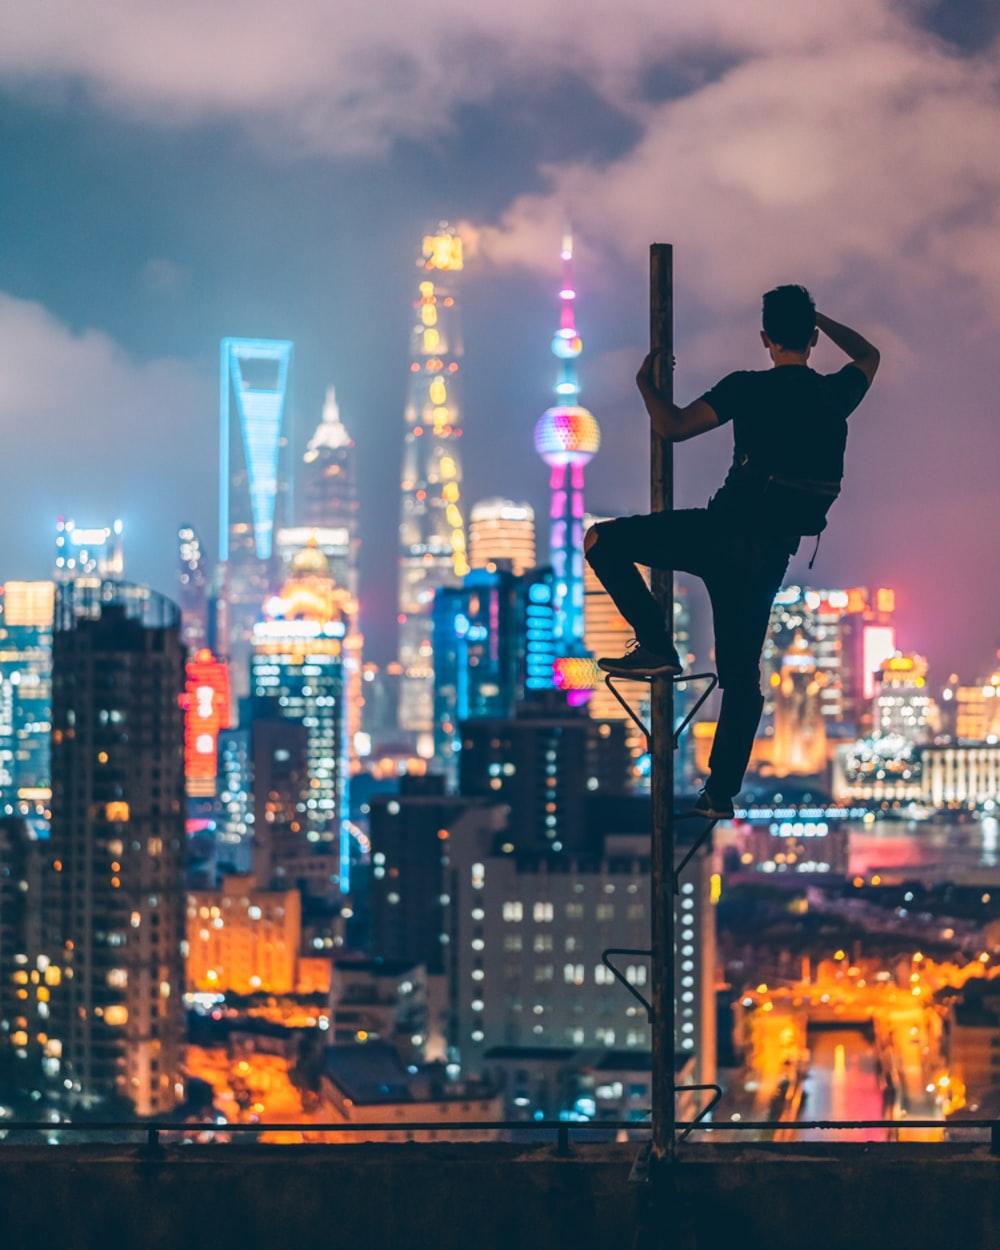 man climbing on rooftop post